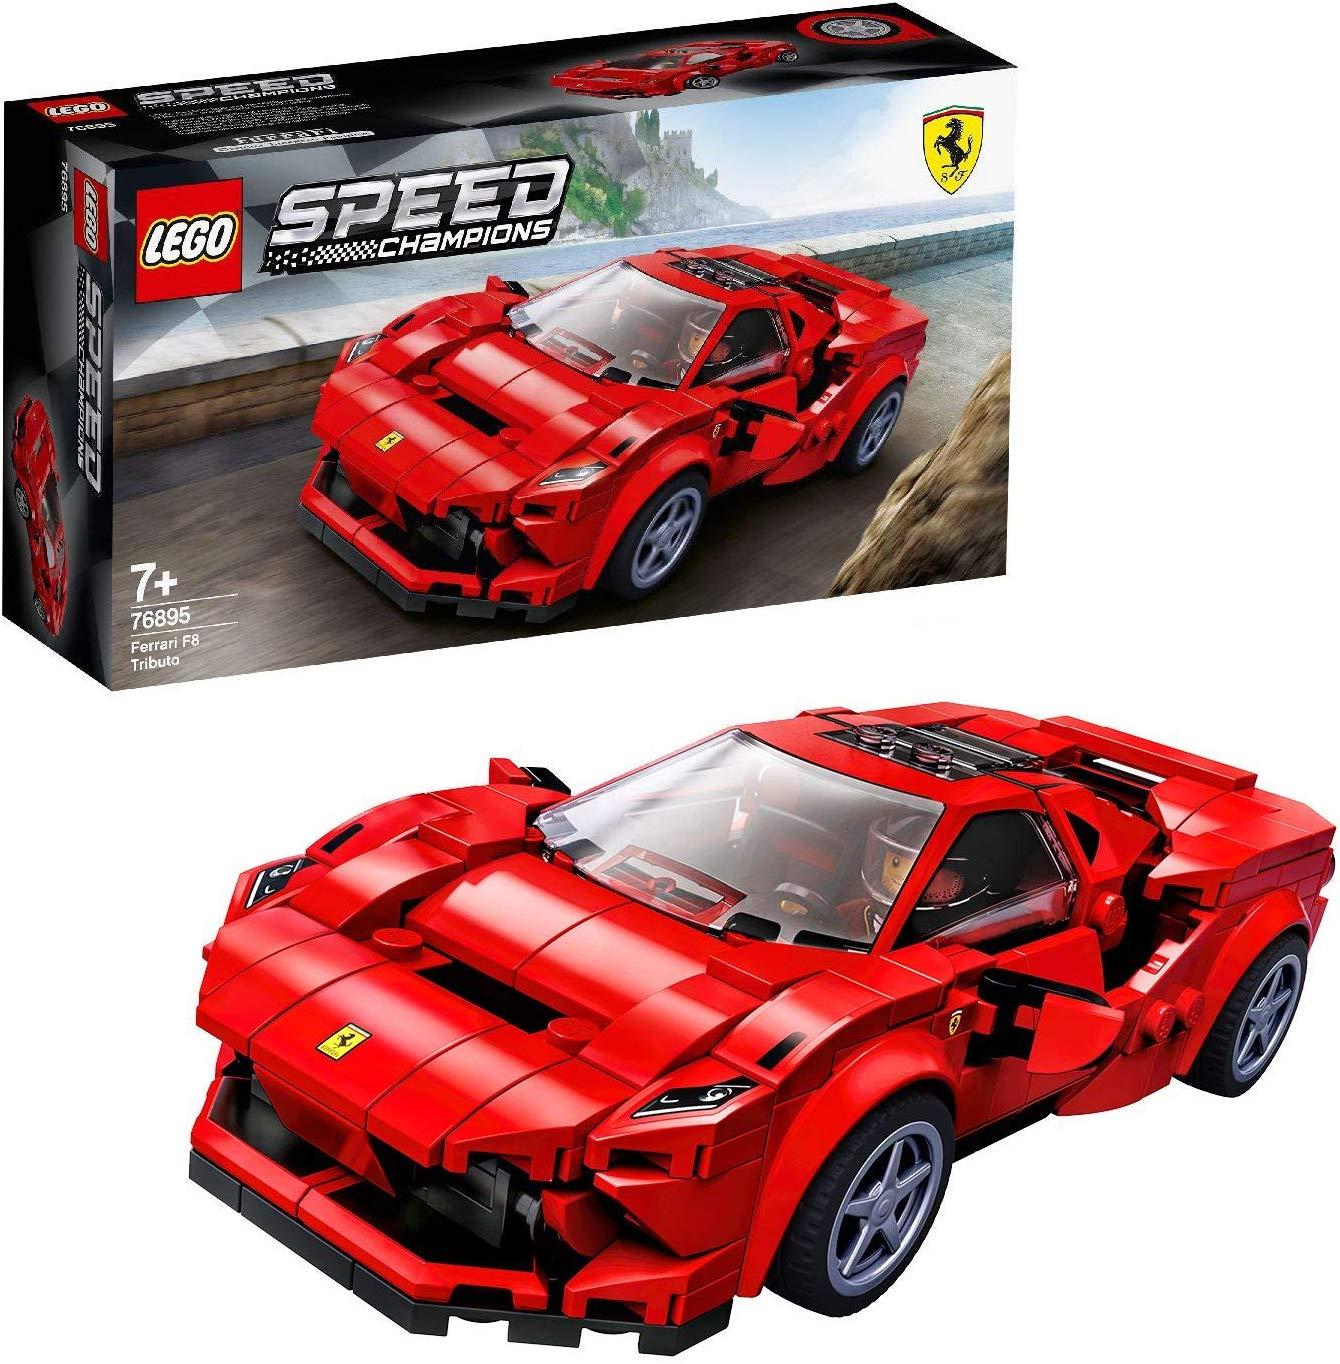 Magrudy.com - LEGO Speed Champions Ferrari F8 Tributo 76895 